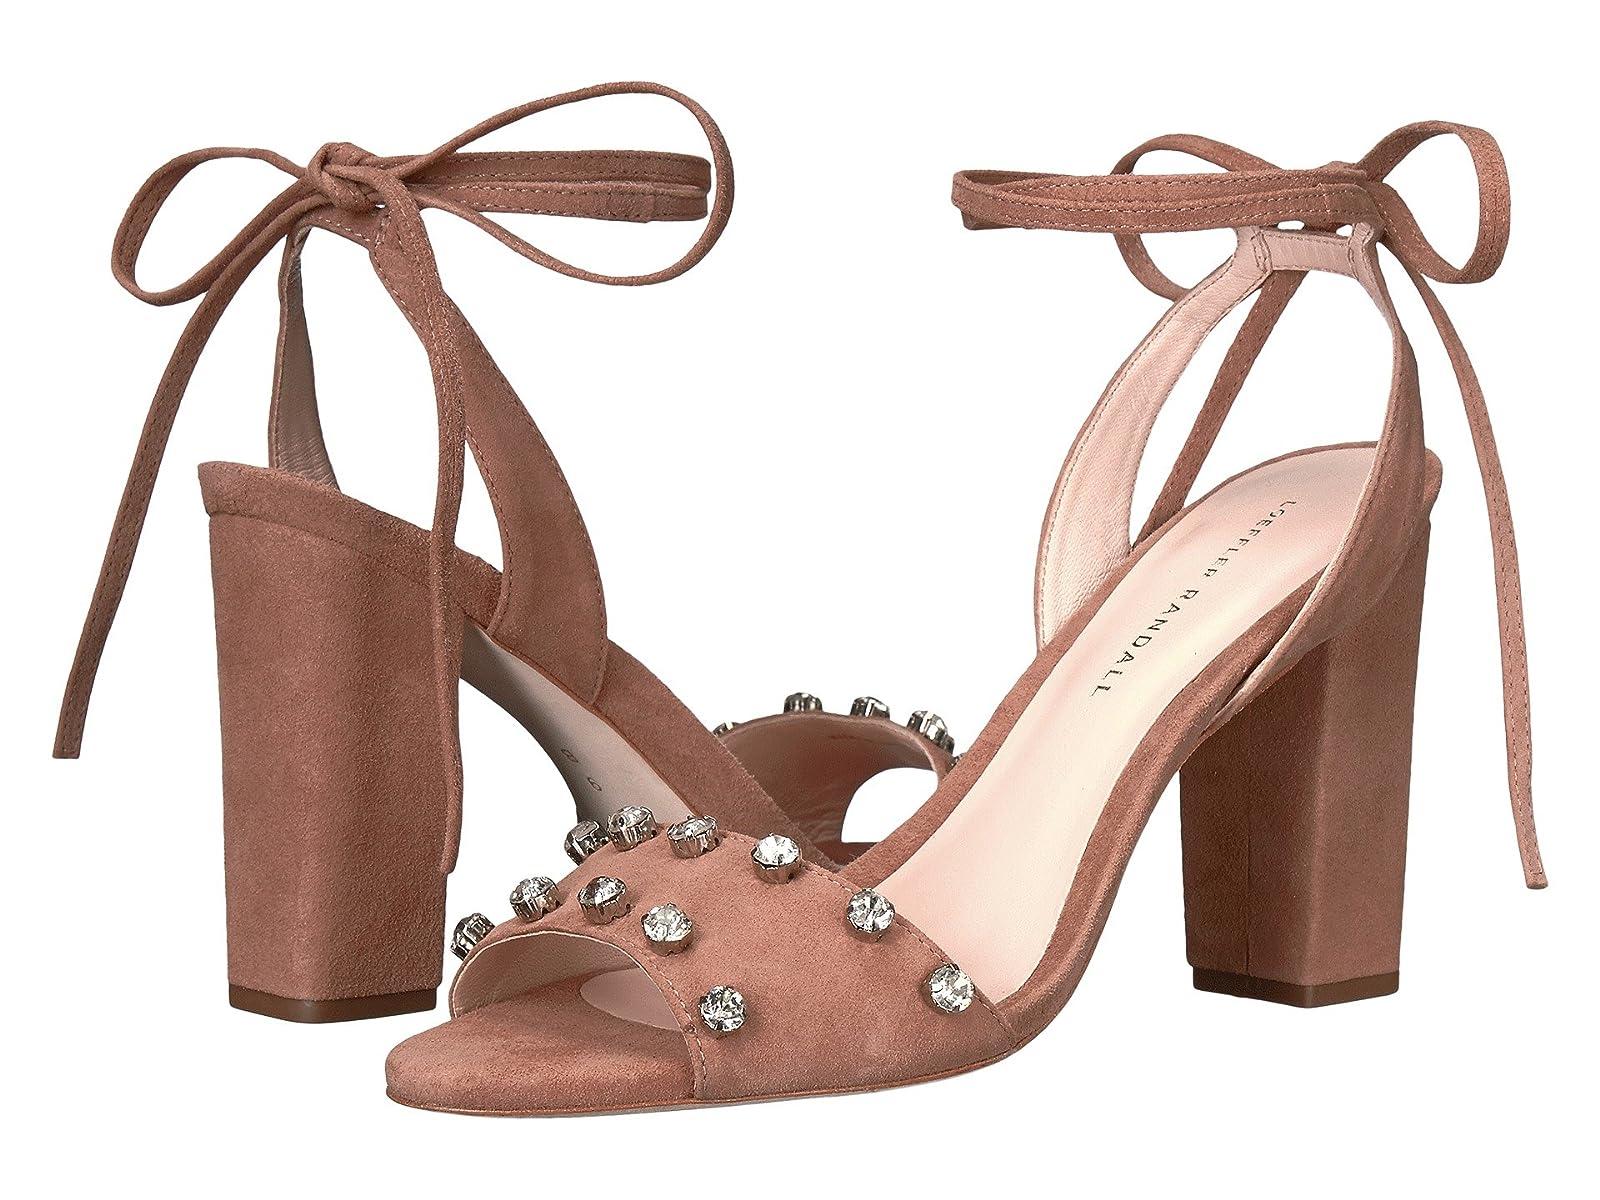 Loeffler Randall ElaynaCheap and distinctive eye-catching shoes